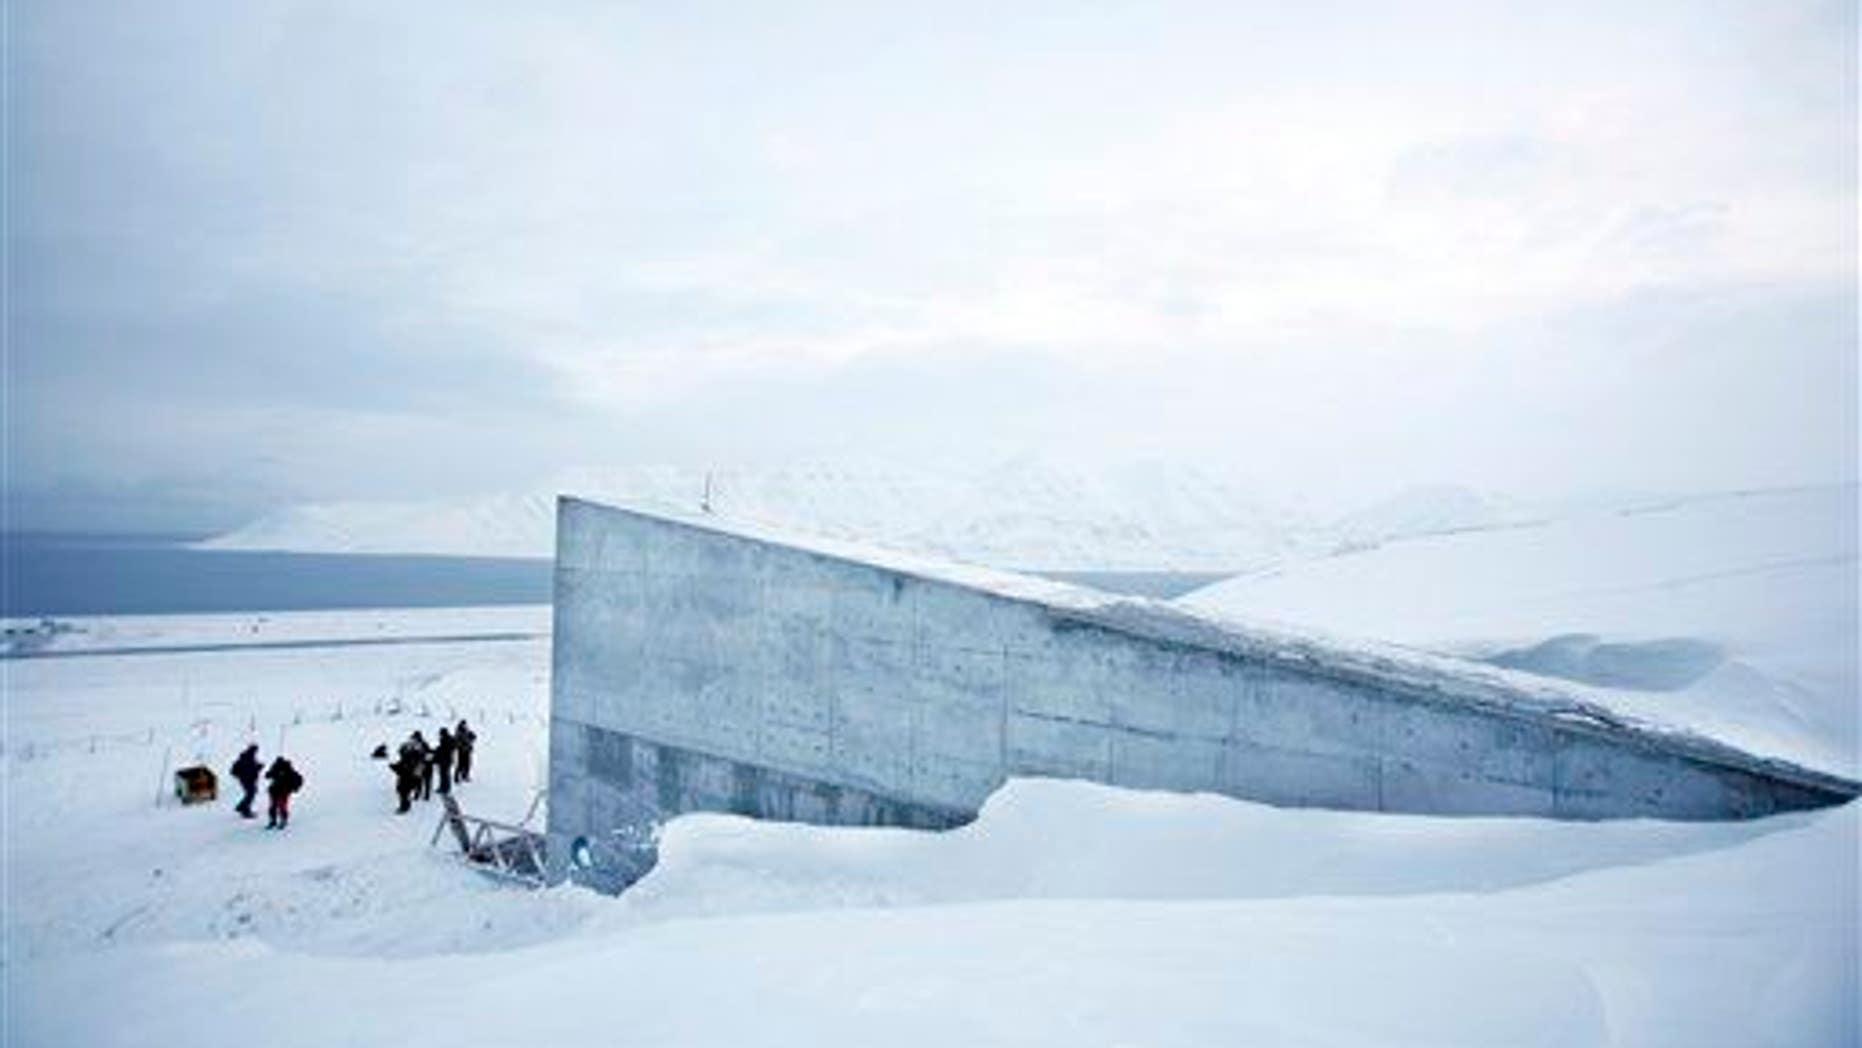 The Svalbard Global Seed Vault is seen Feb. 25, 2008 near Longyearbyen, Norway.